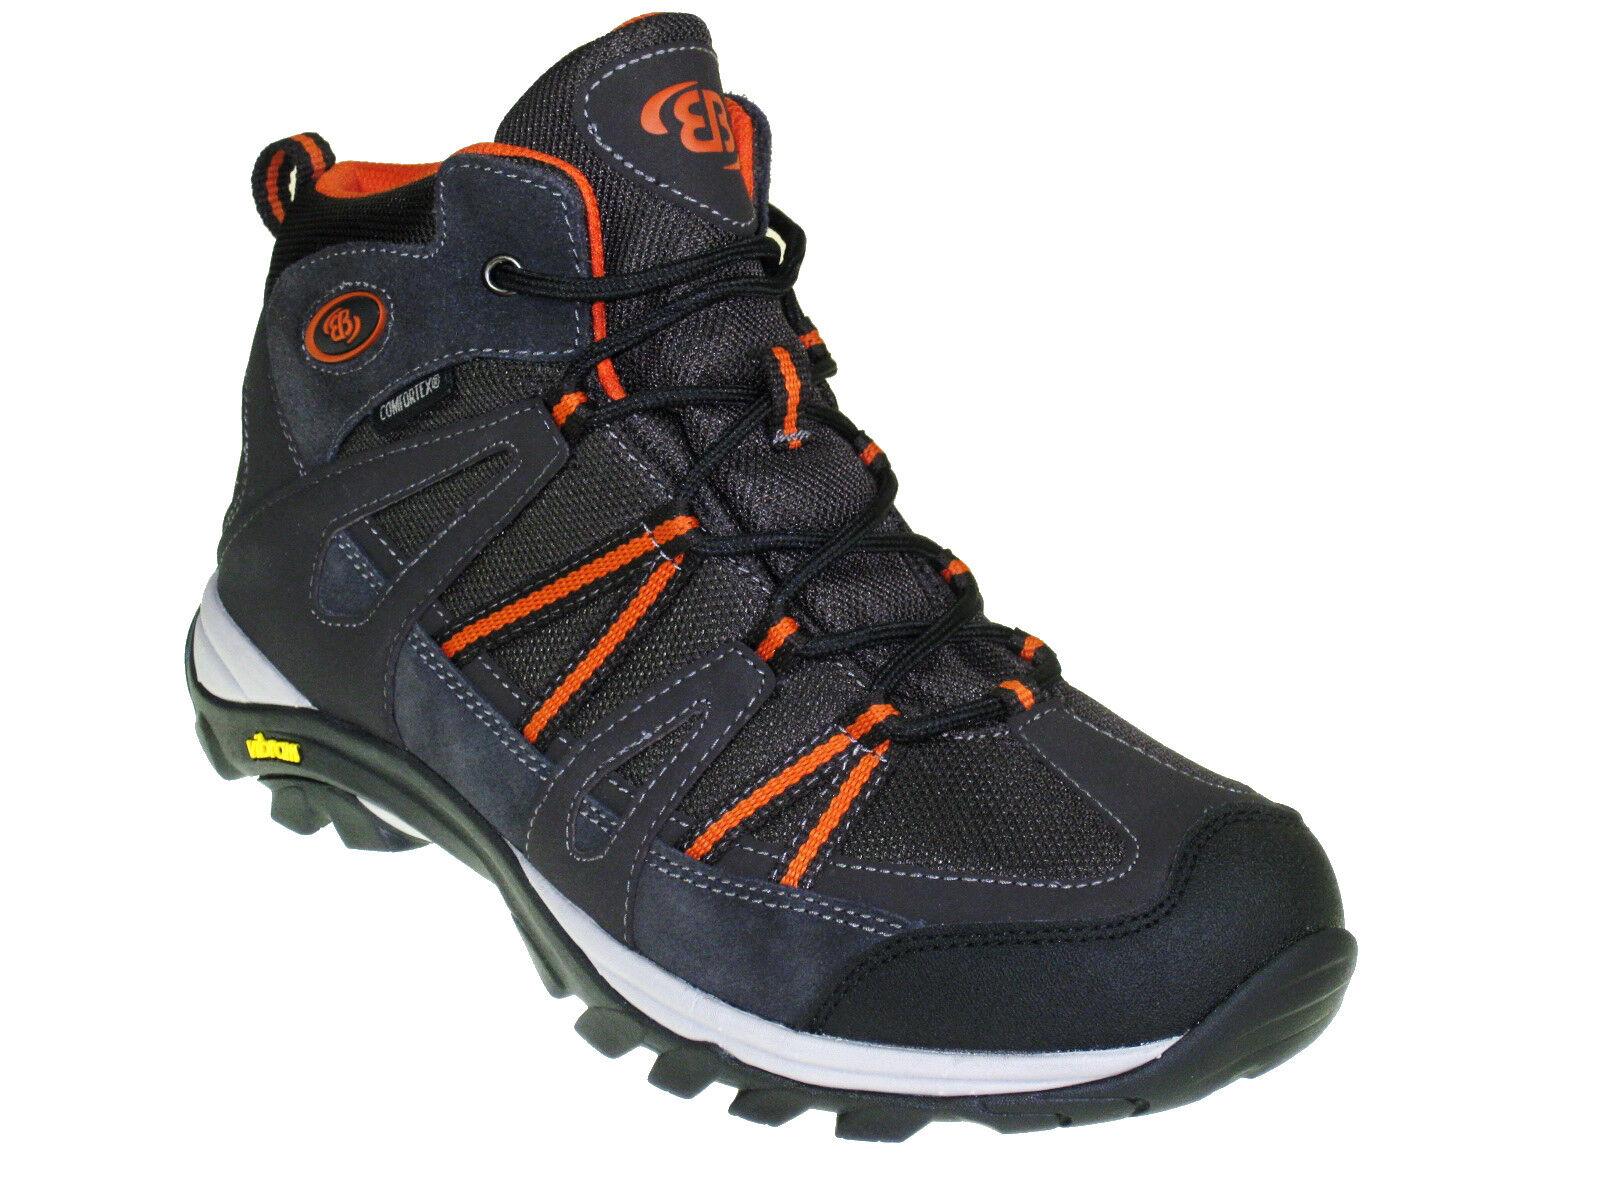 NUOVO Brütting TORNADO HIGH scarpe da uomo in pelle-Trekking-Scarponi eb24